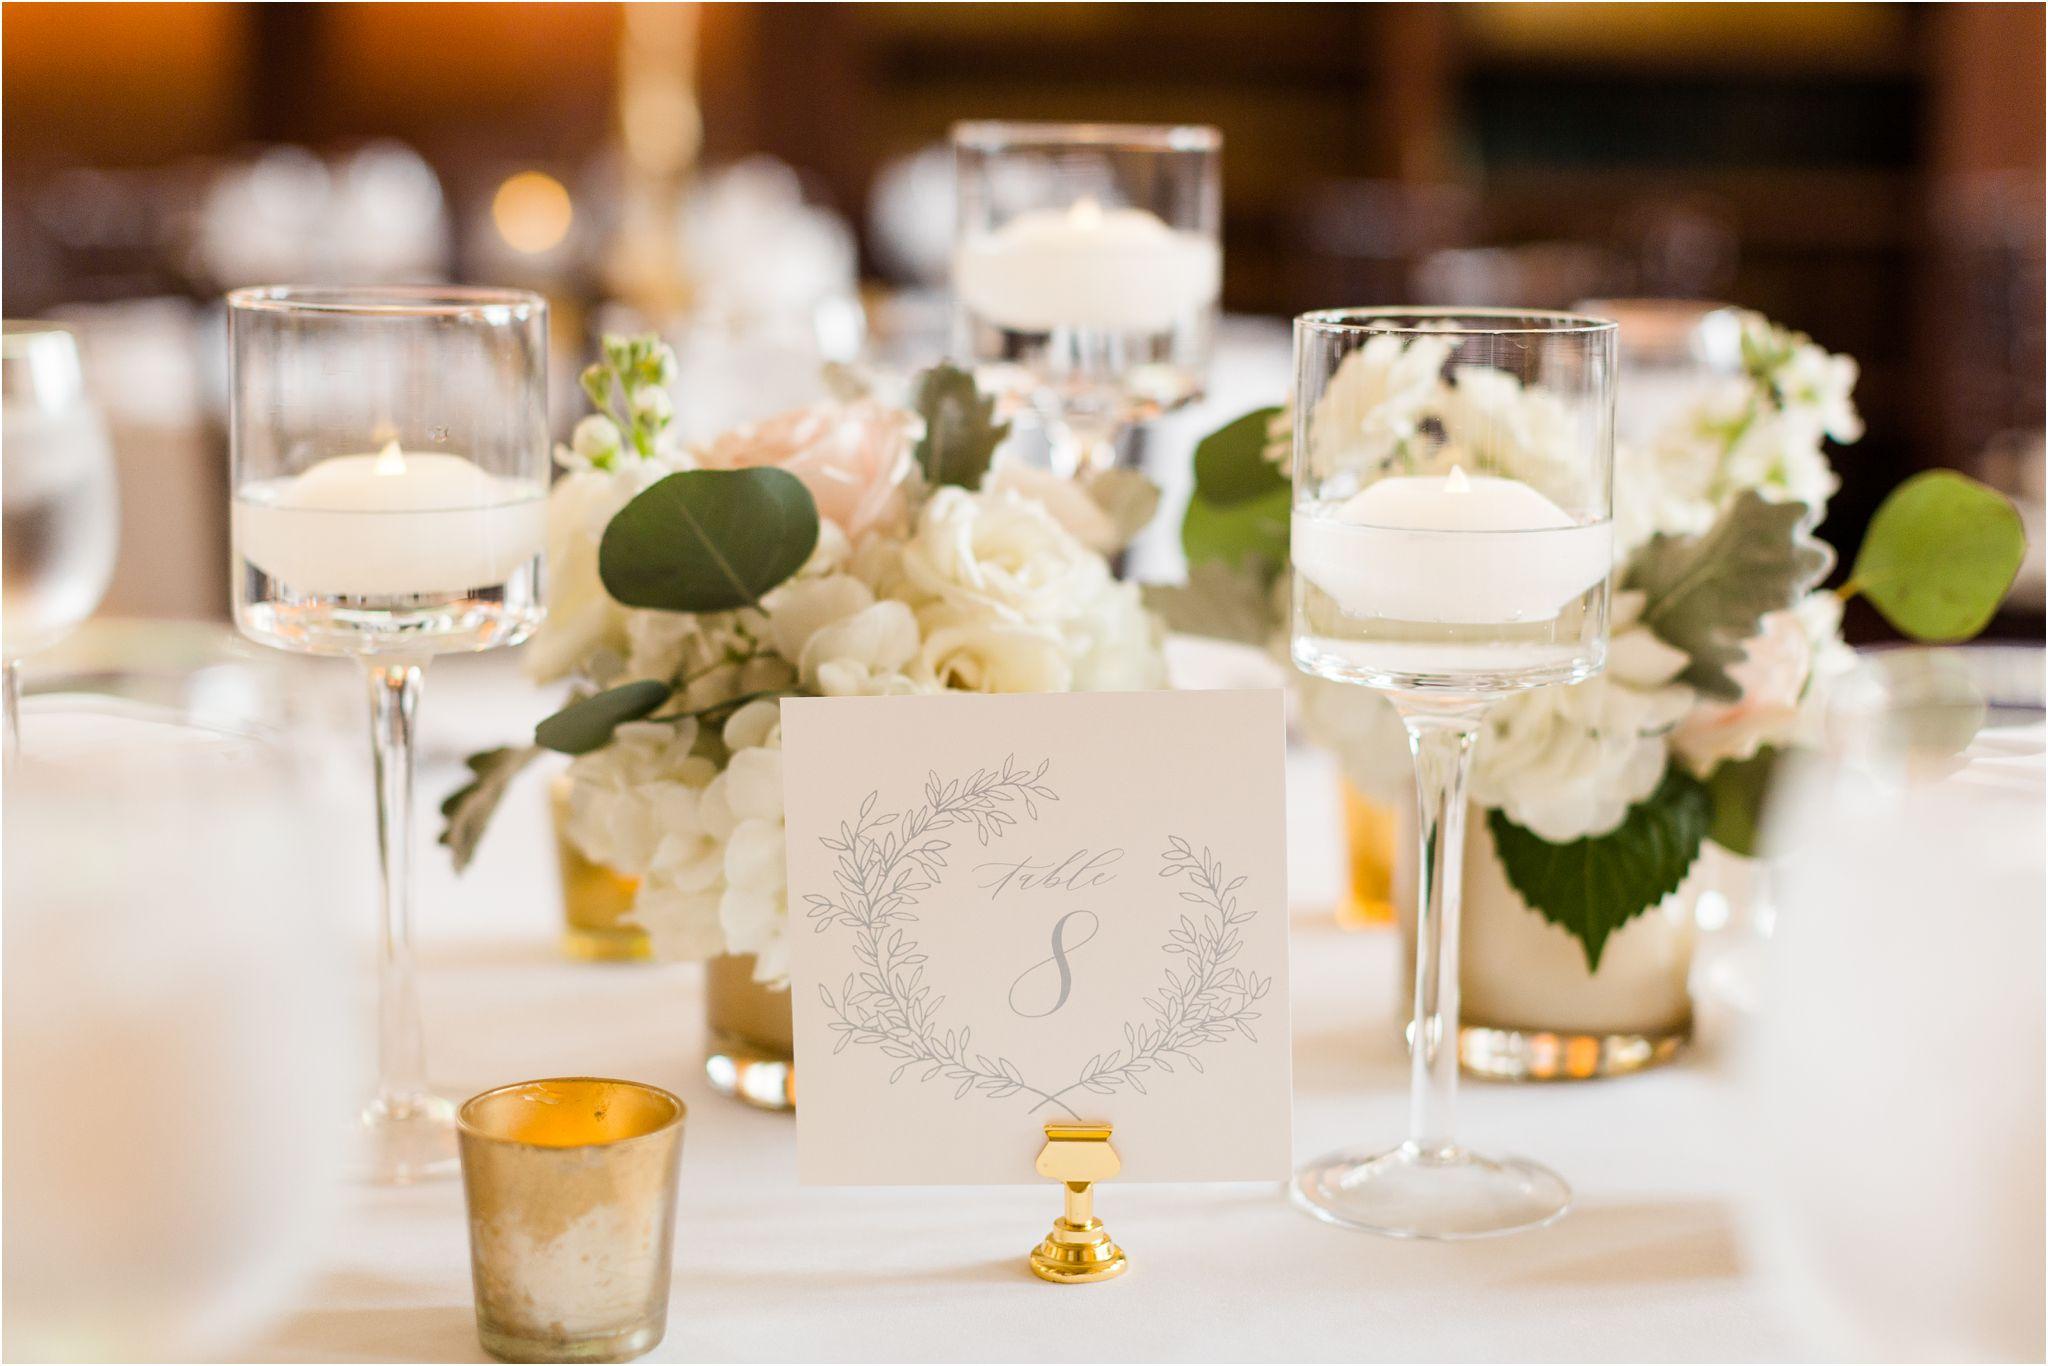 providence-public-library-wedding-images_00037.JPG